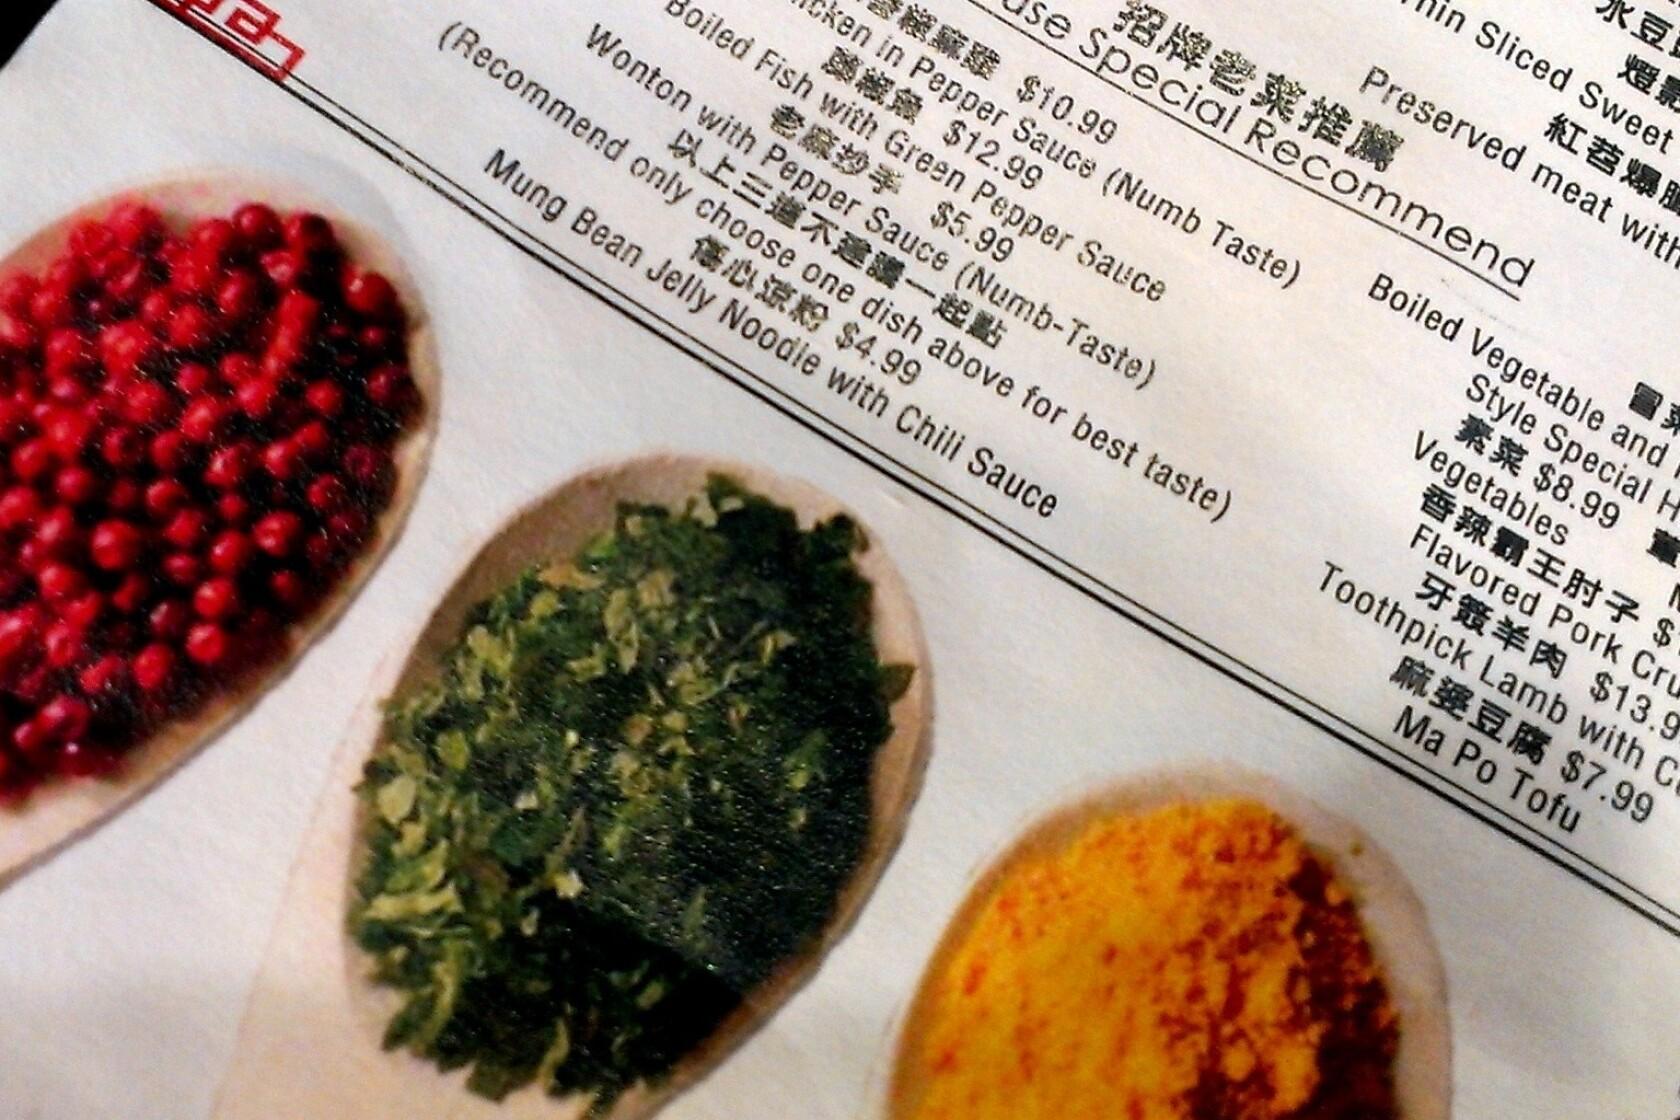 Chengdu Taste's 'secret menu' revealed: spicy shrimp with